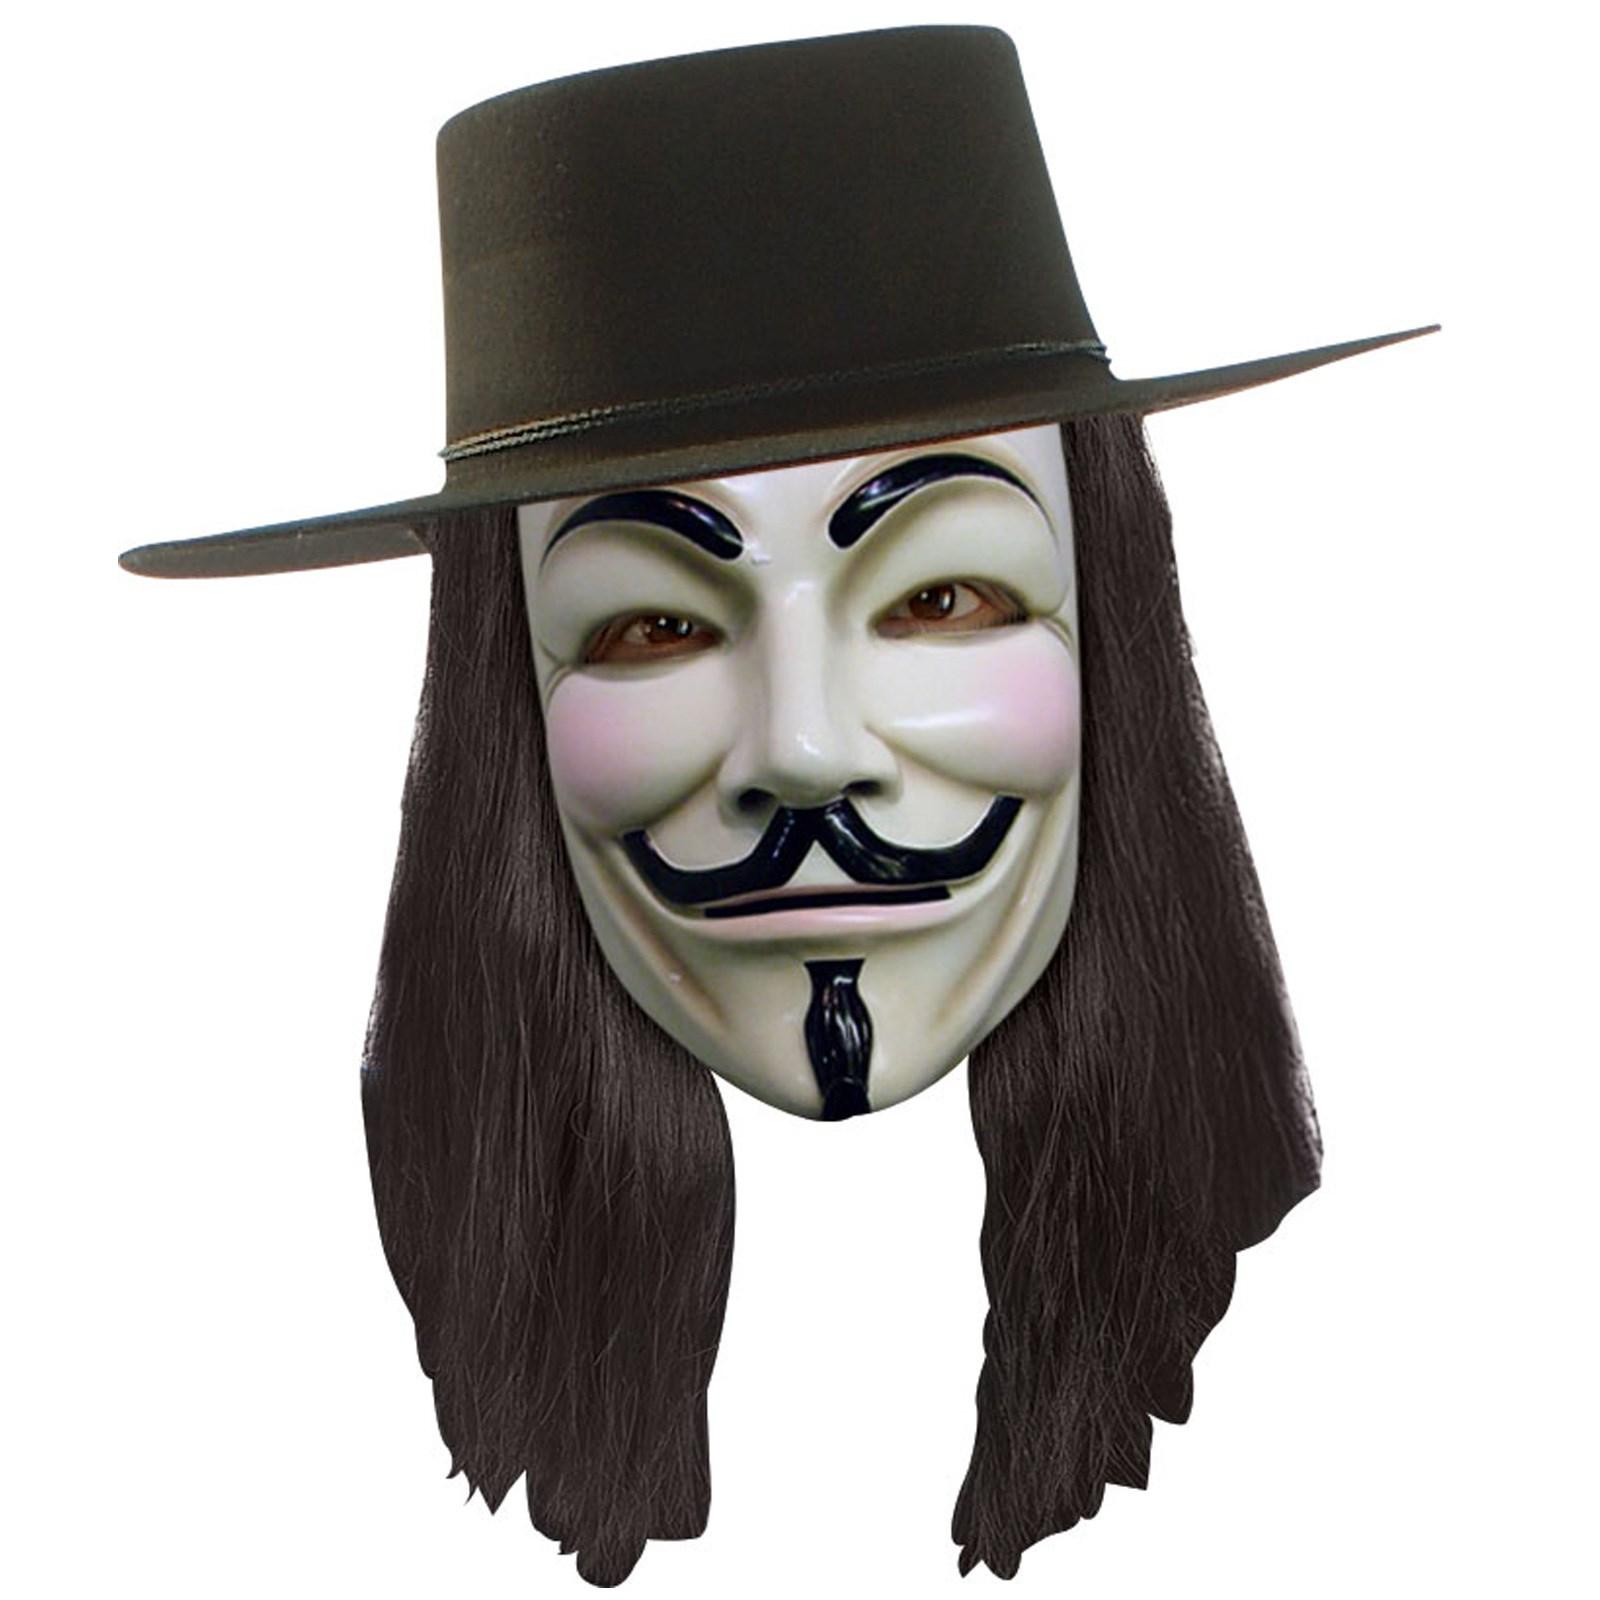 V for Vendetta Mask | BuyCostumes.com